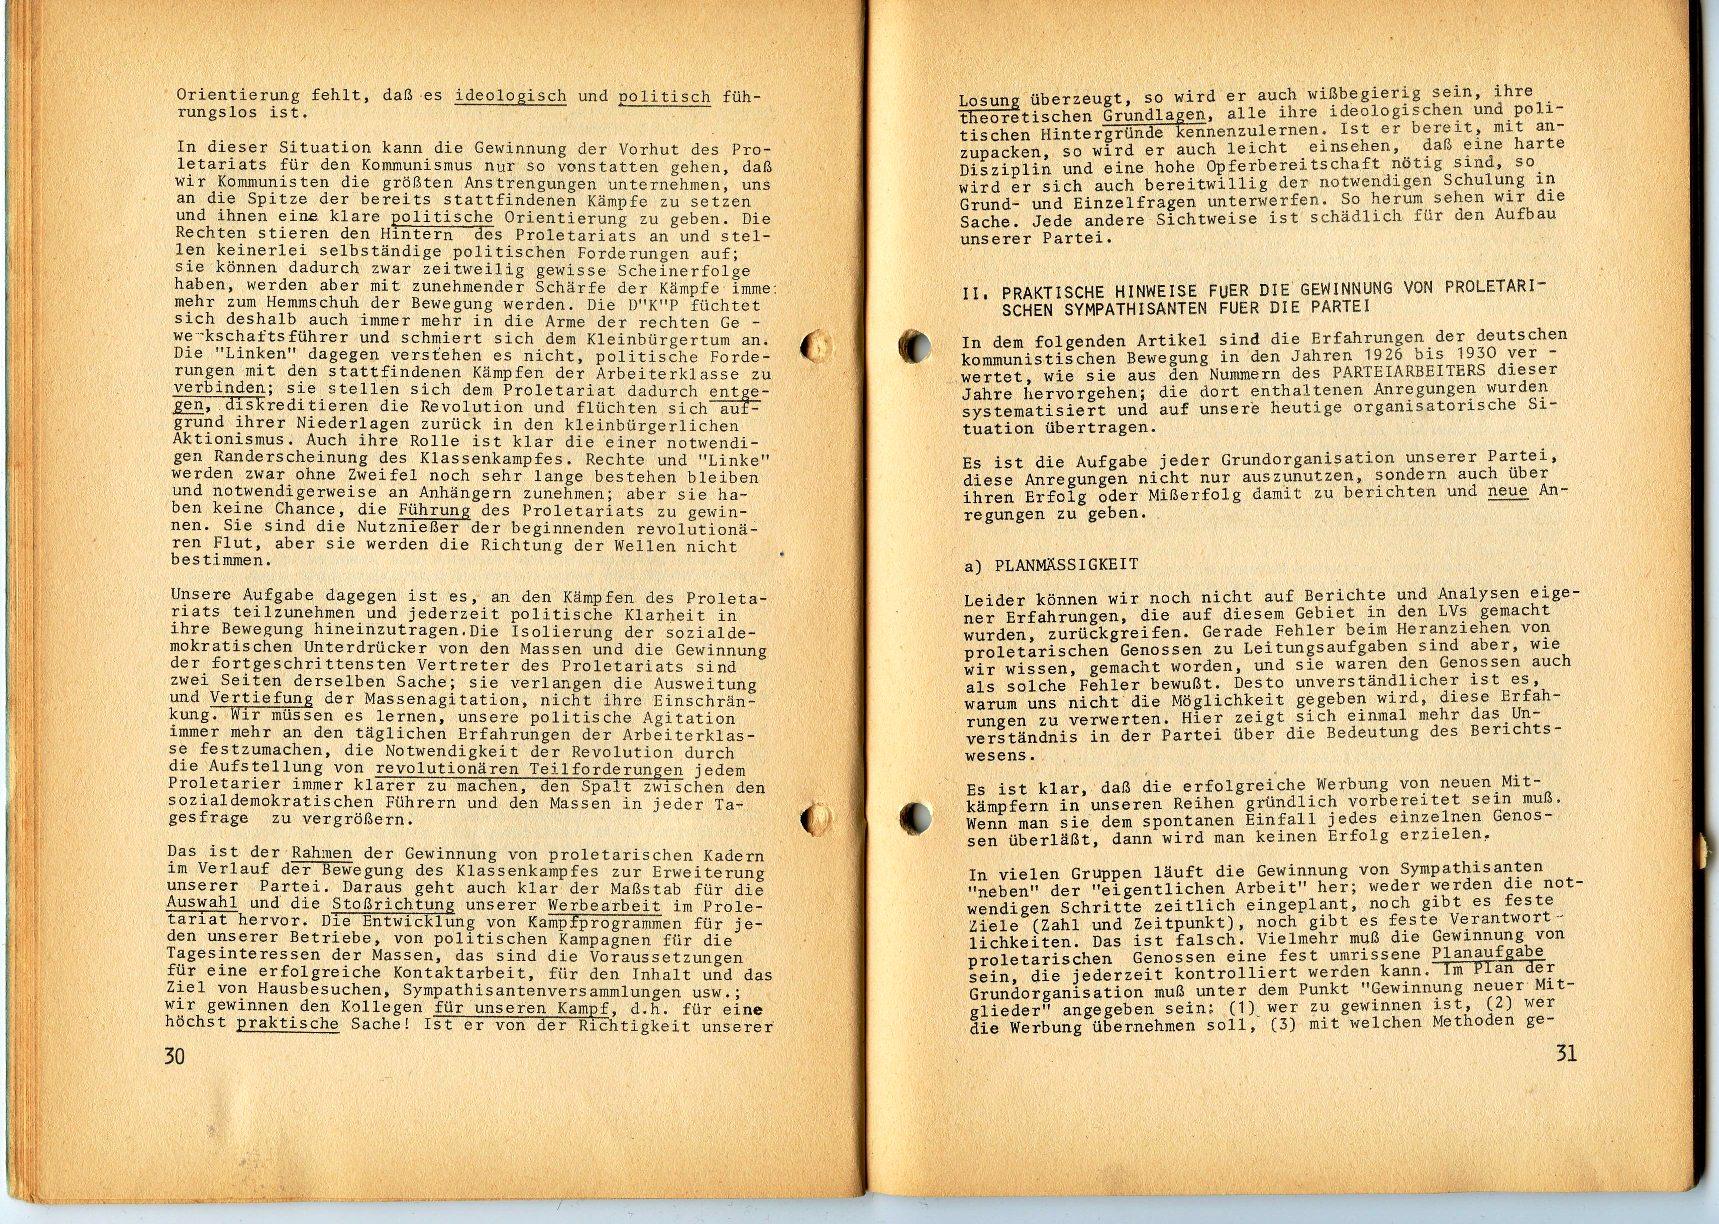 ZB_Parteiarbeiter_1971_04_16